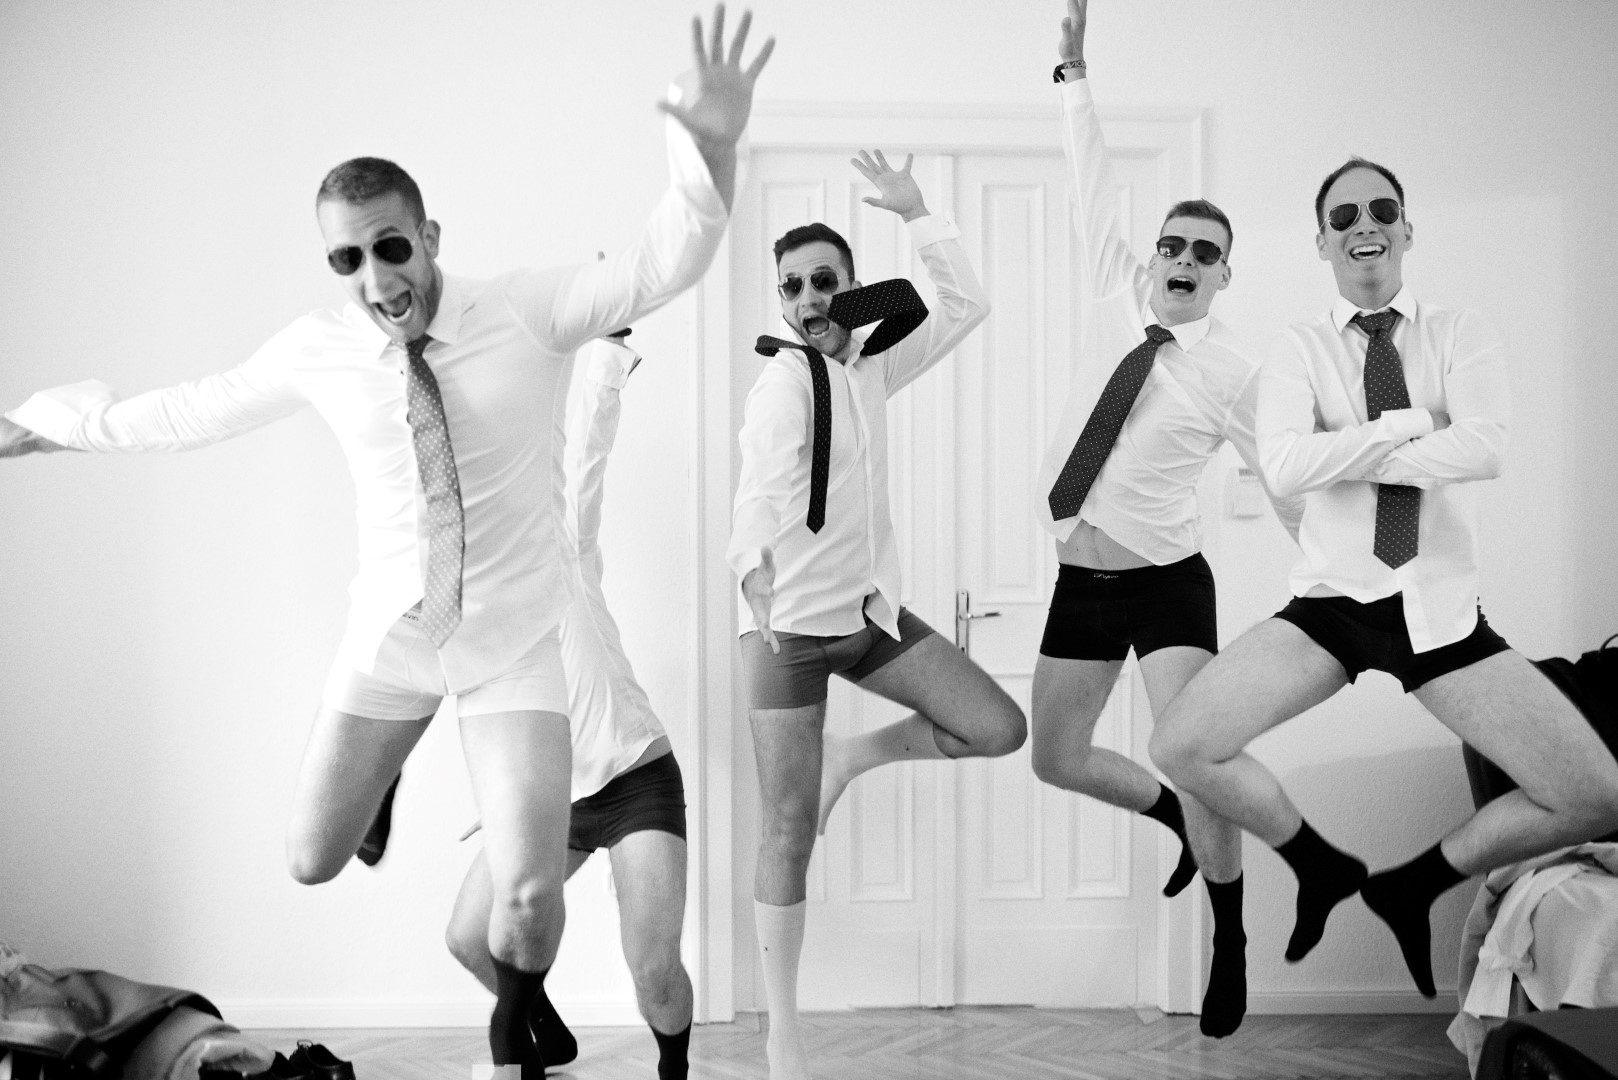 ,herczeg zoltán,herczeg zoltán fotós,herczeg zoltán fotográfus,esküvőfotós,esküvői fotós,legjobb esküvőfotós,legjobb esküvői fotós,